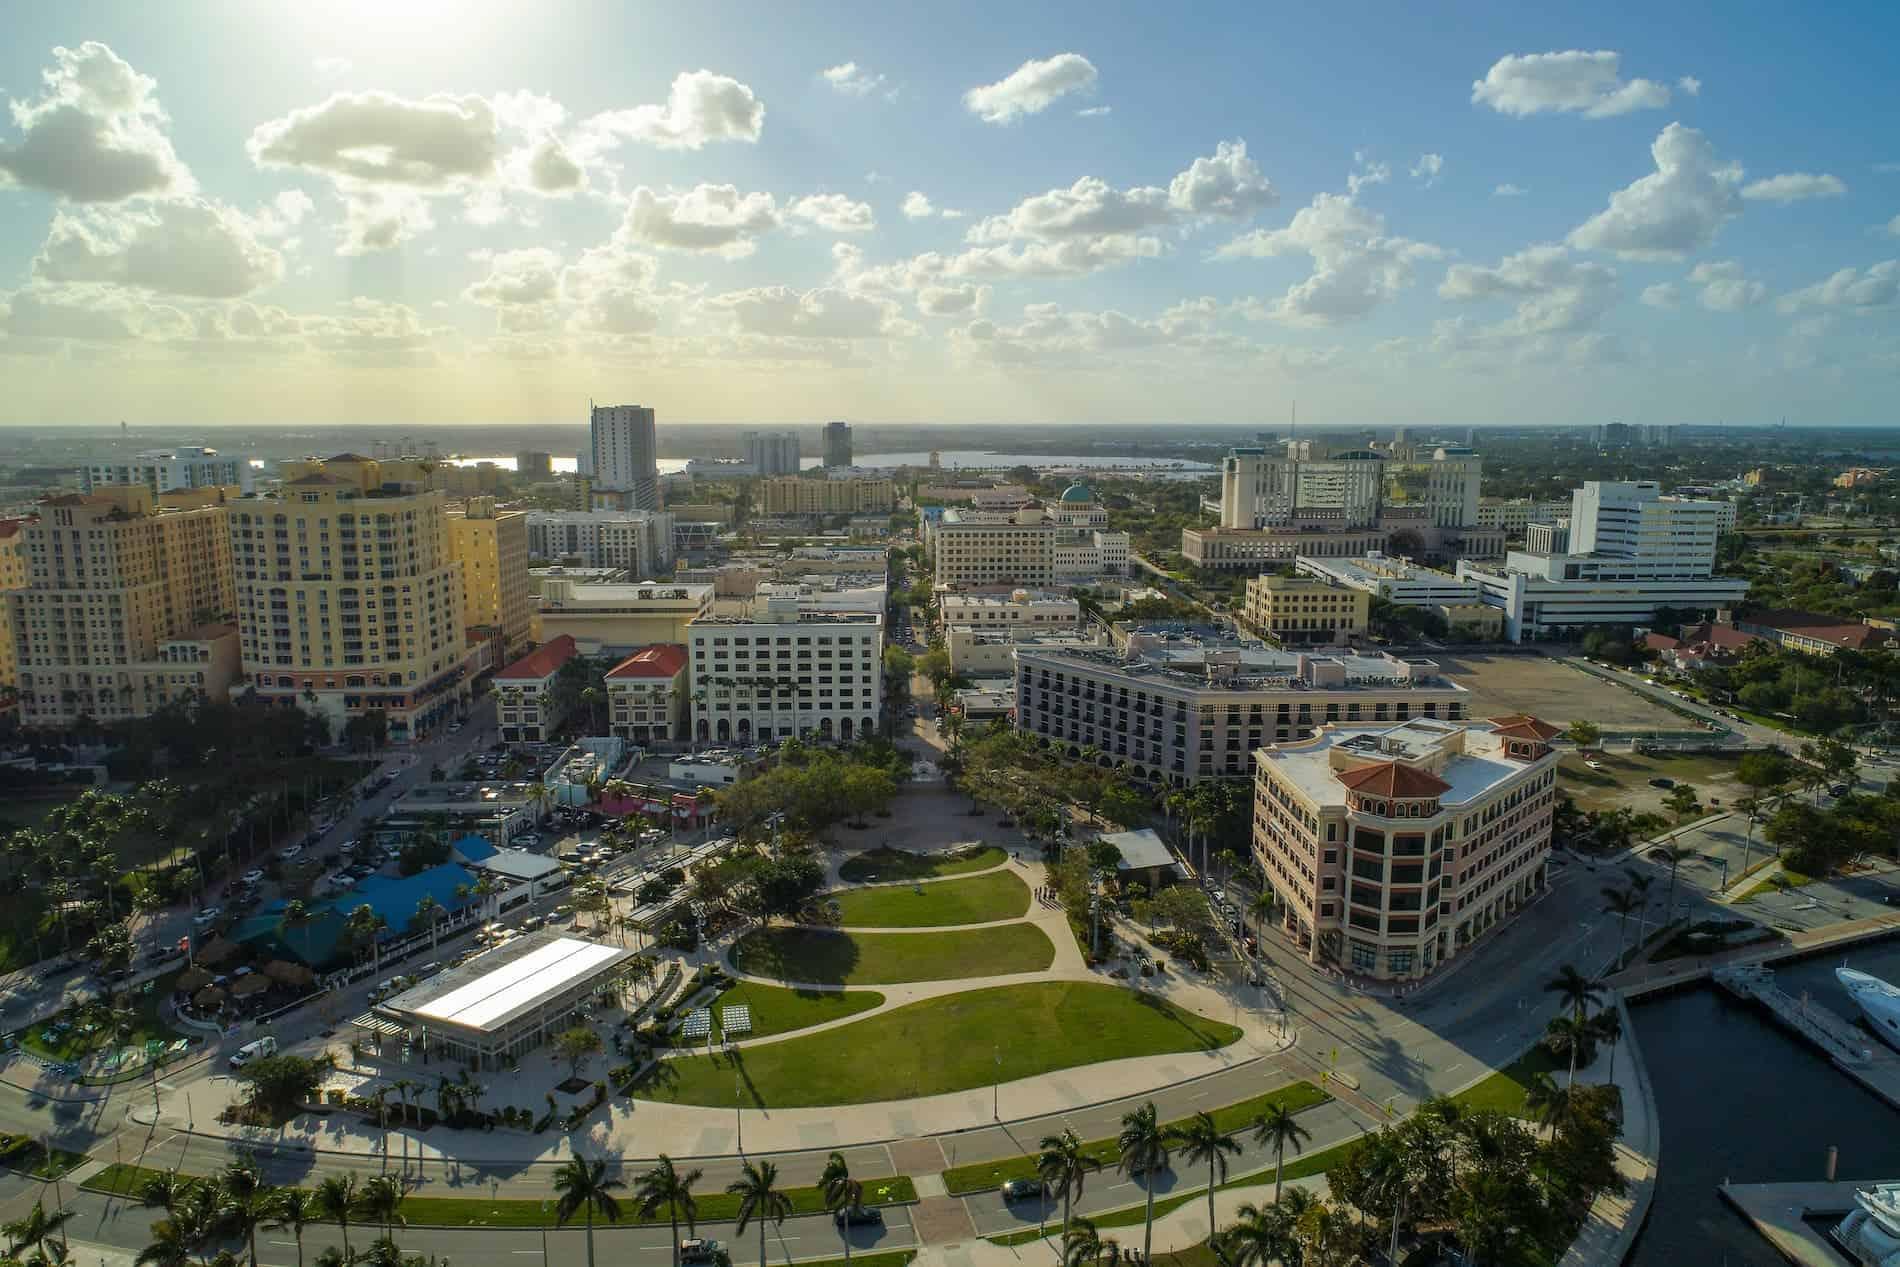 Flagler Park in West Palm Beach Florida